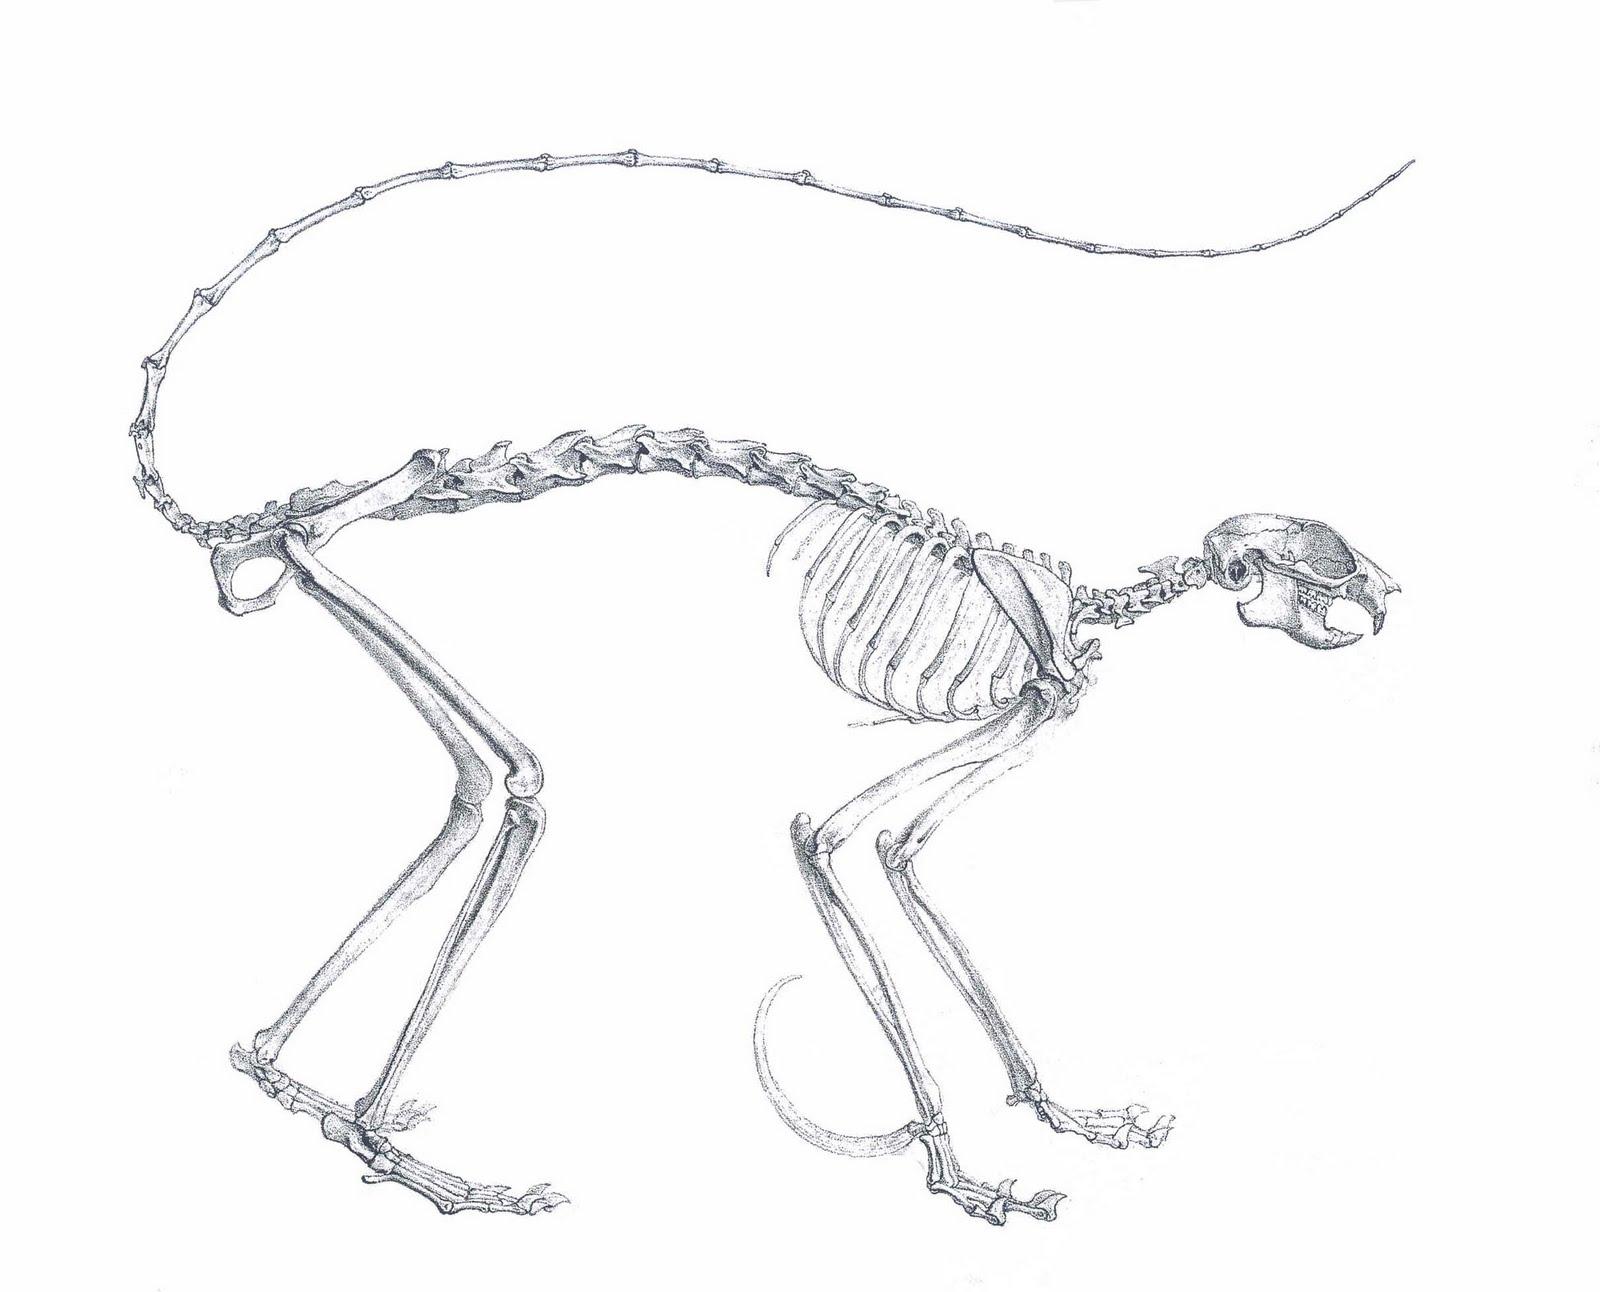 Bear Skull Diagram Redarc Solenoid Wiring Animal Anatomy Comparative Foot